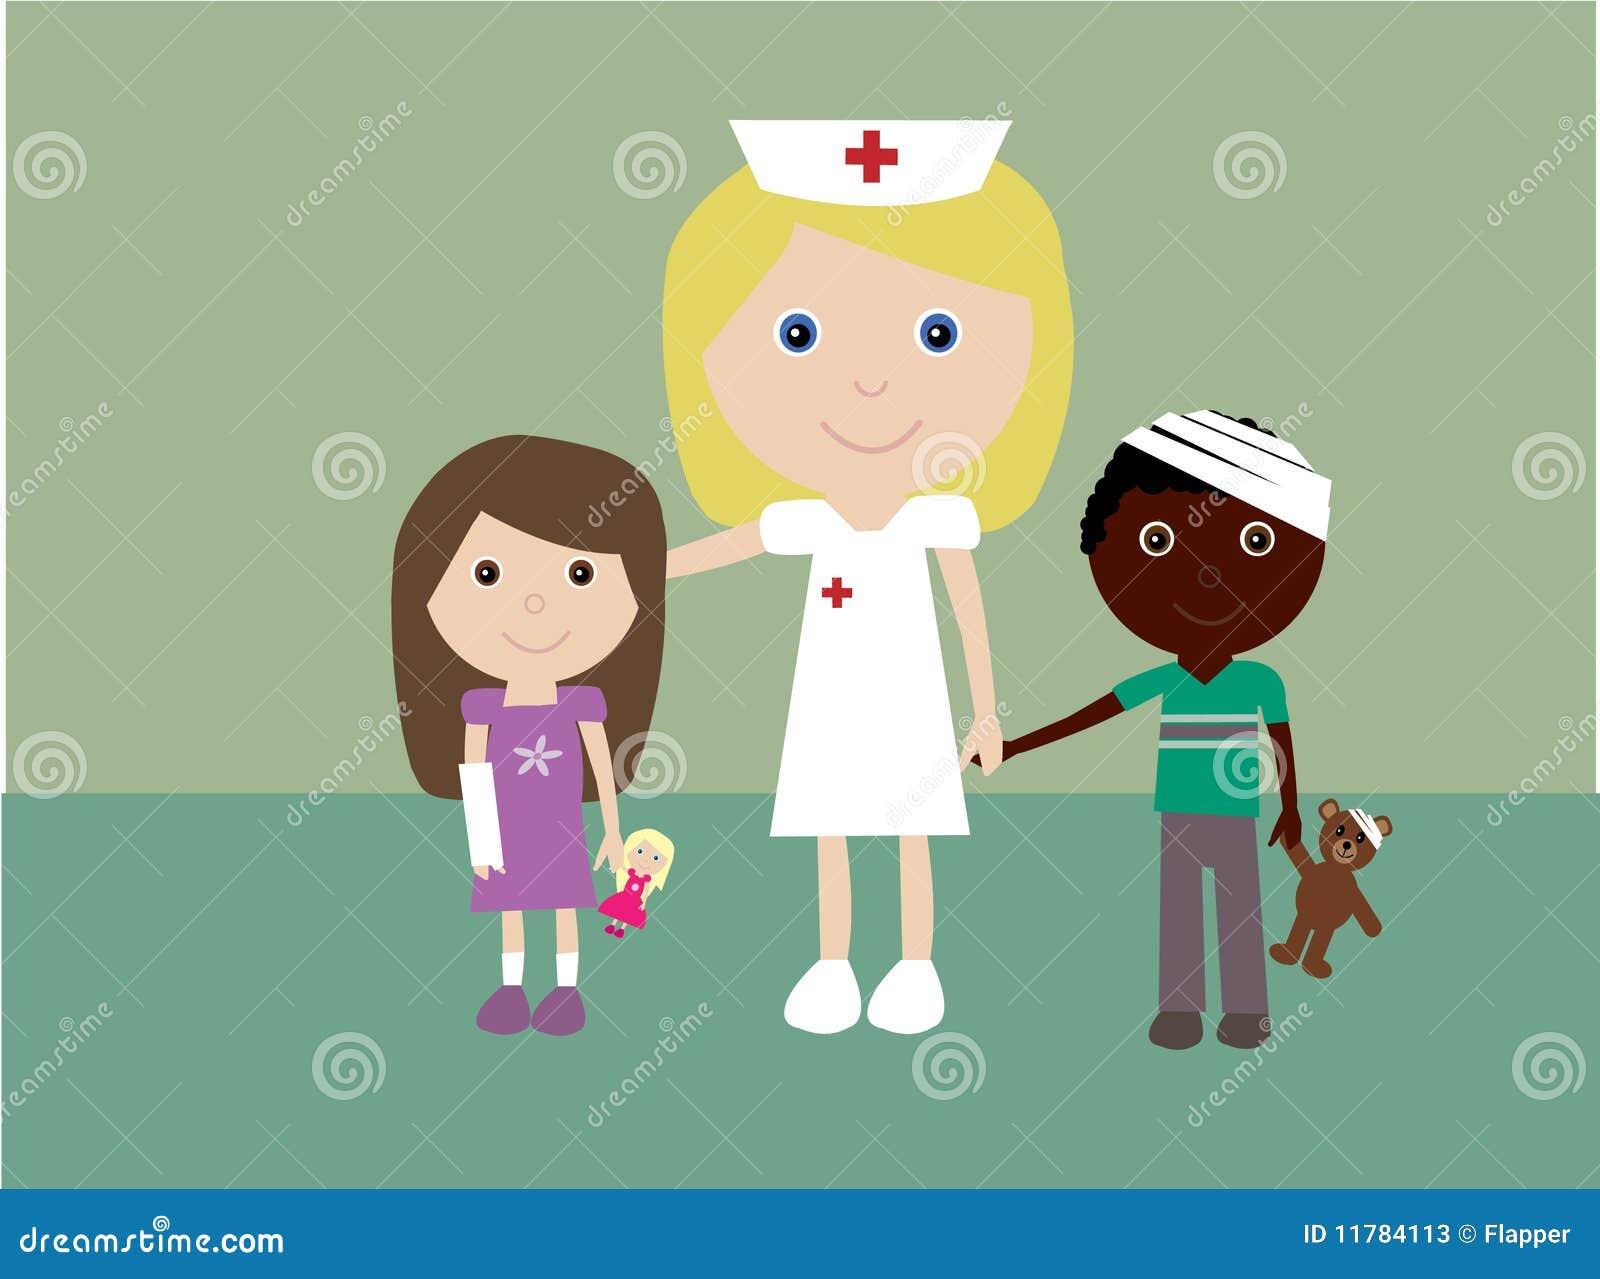 Pediatric Nurse Clipart Pediatric nurse and 2 injured